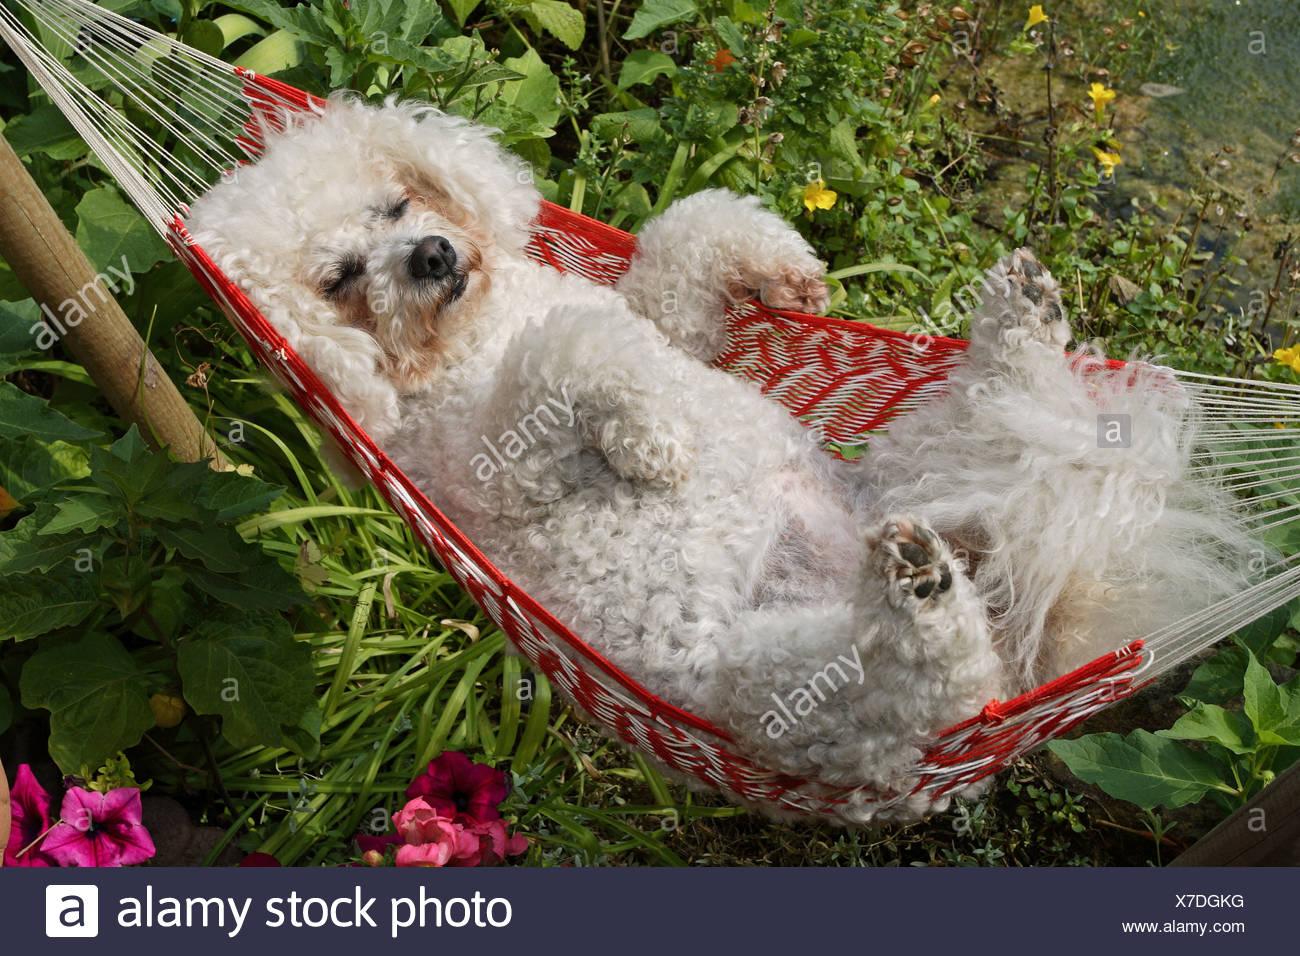 Bichon à poil frisé - in hammock - Stock Image